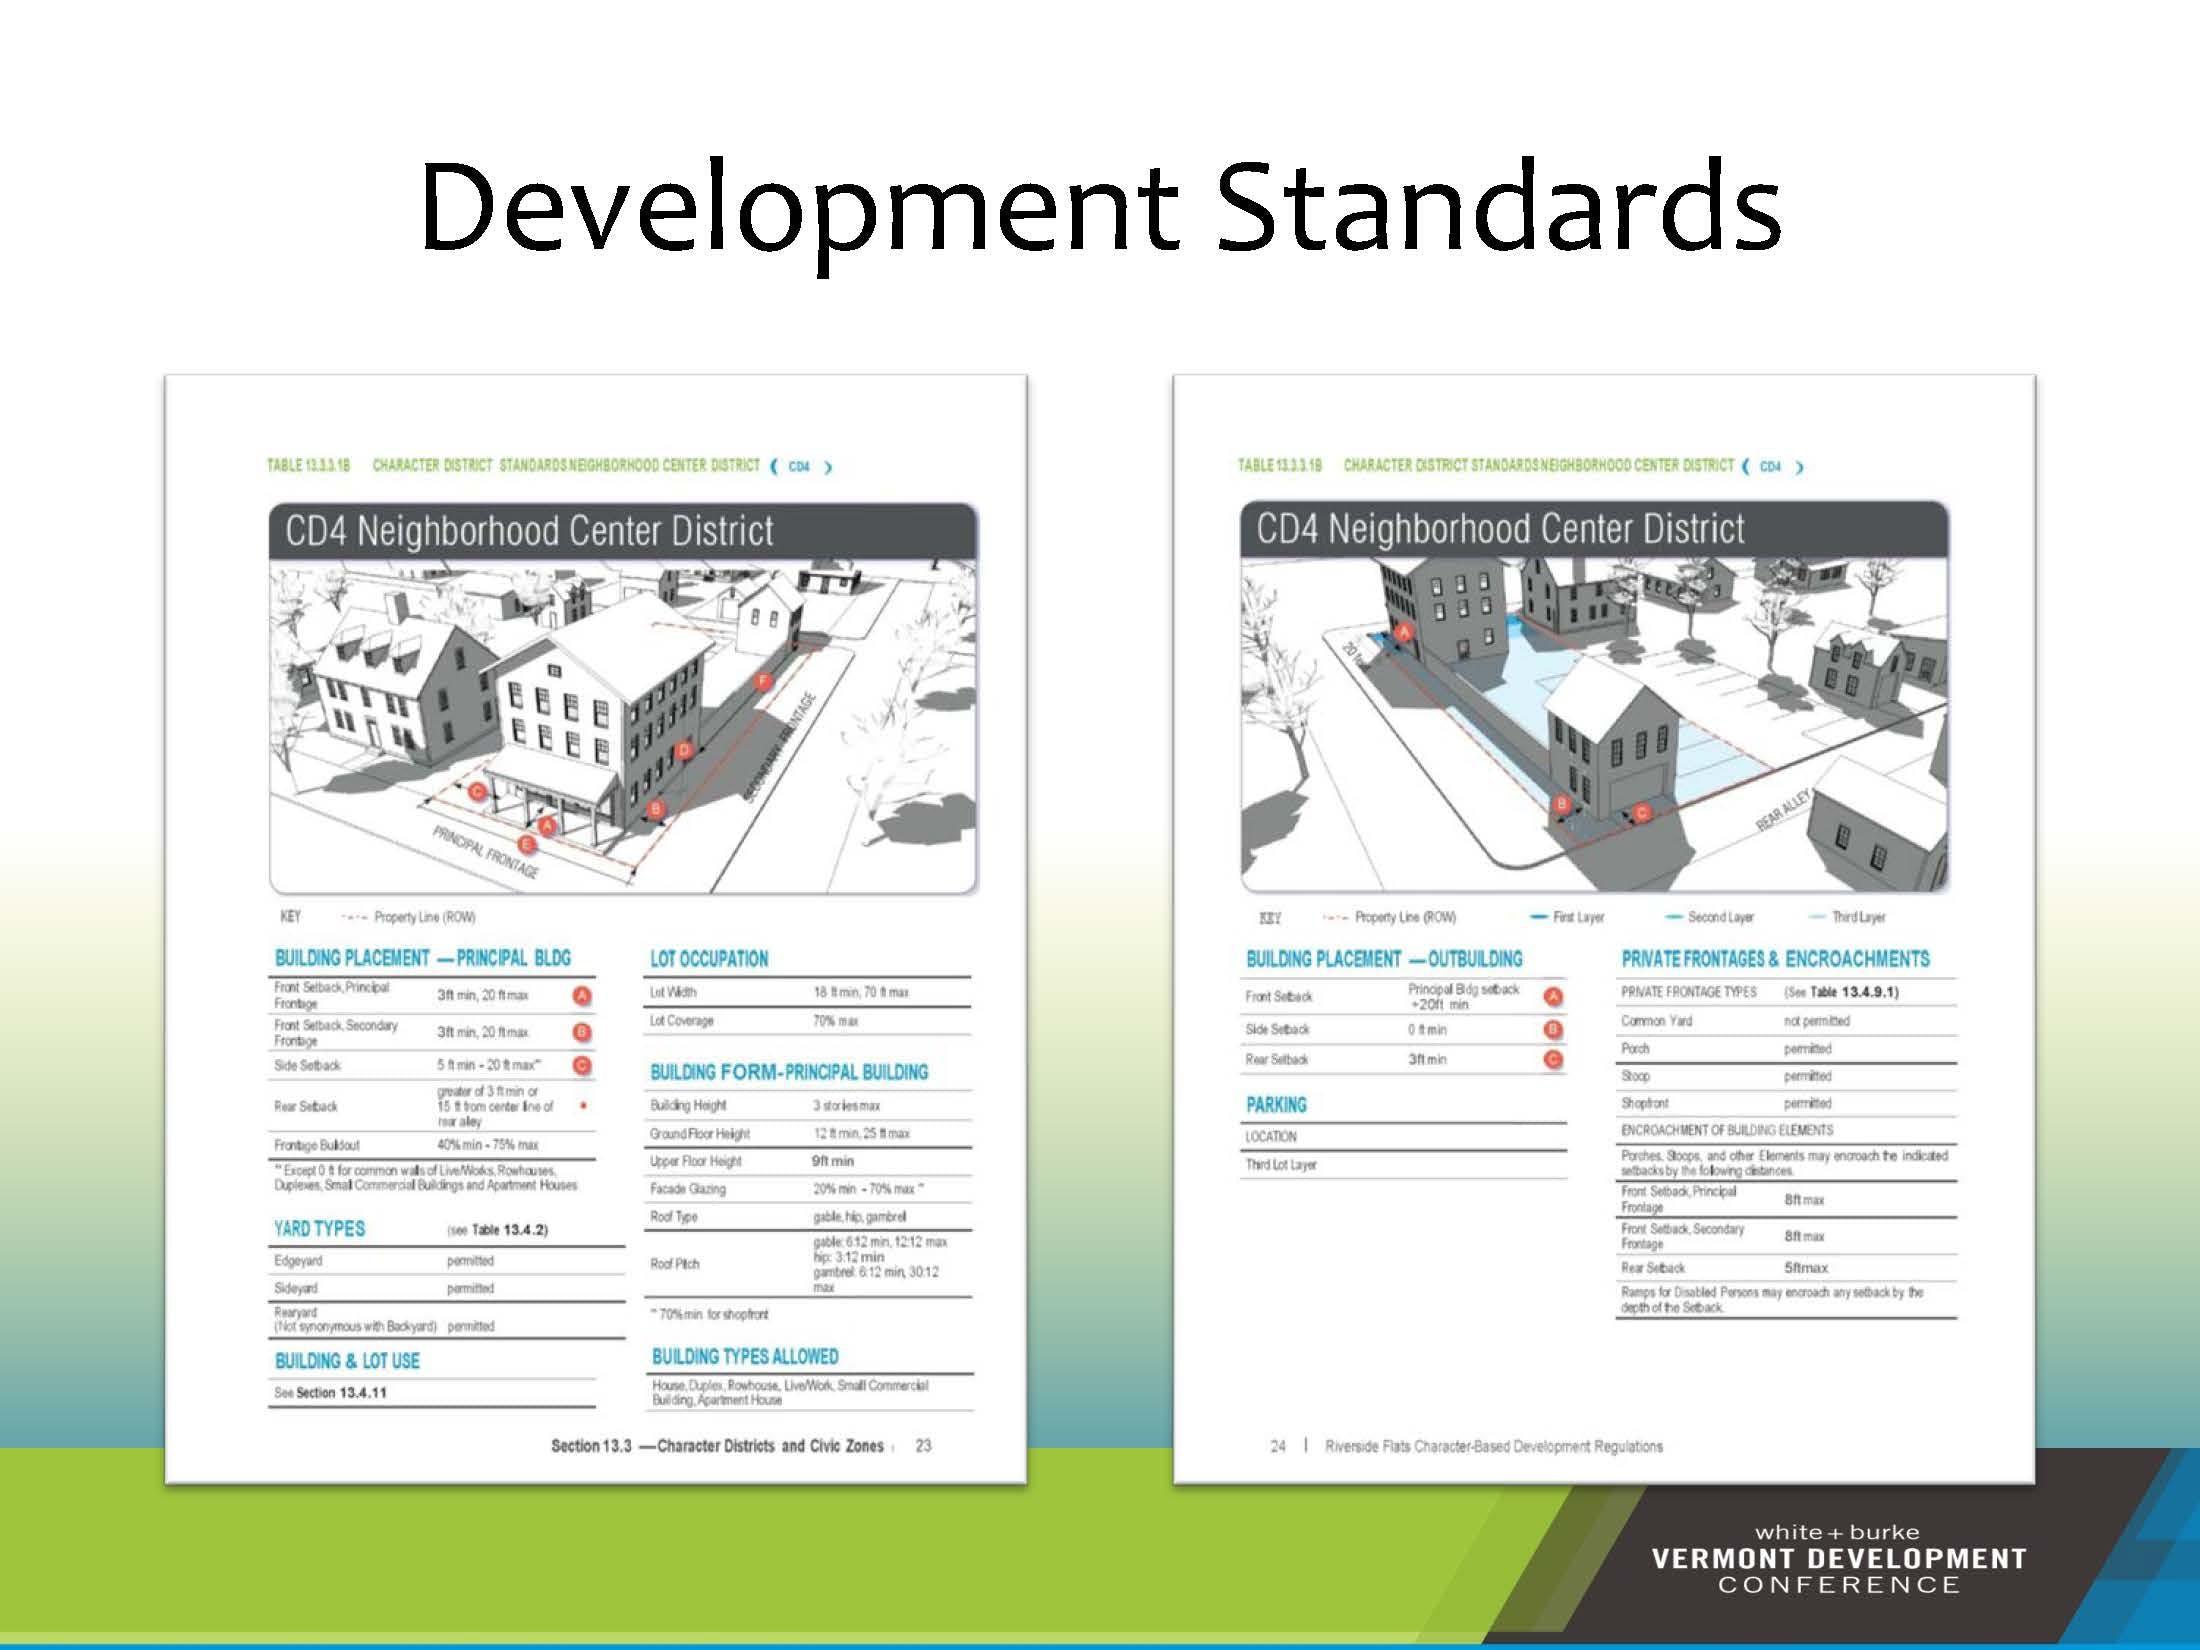 Development Standards